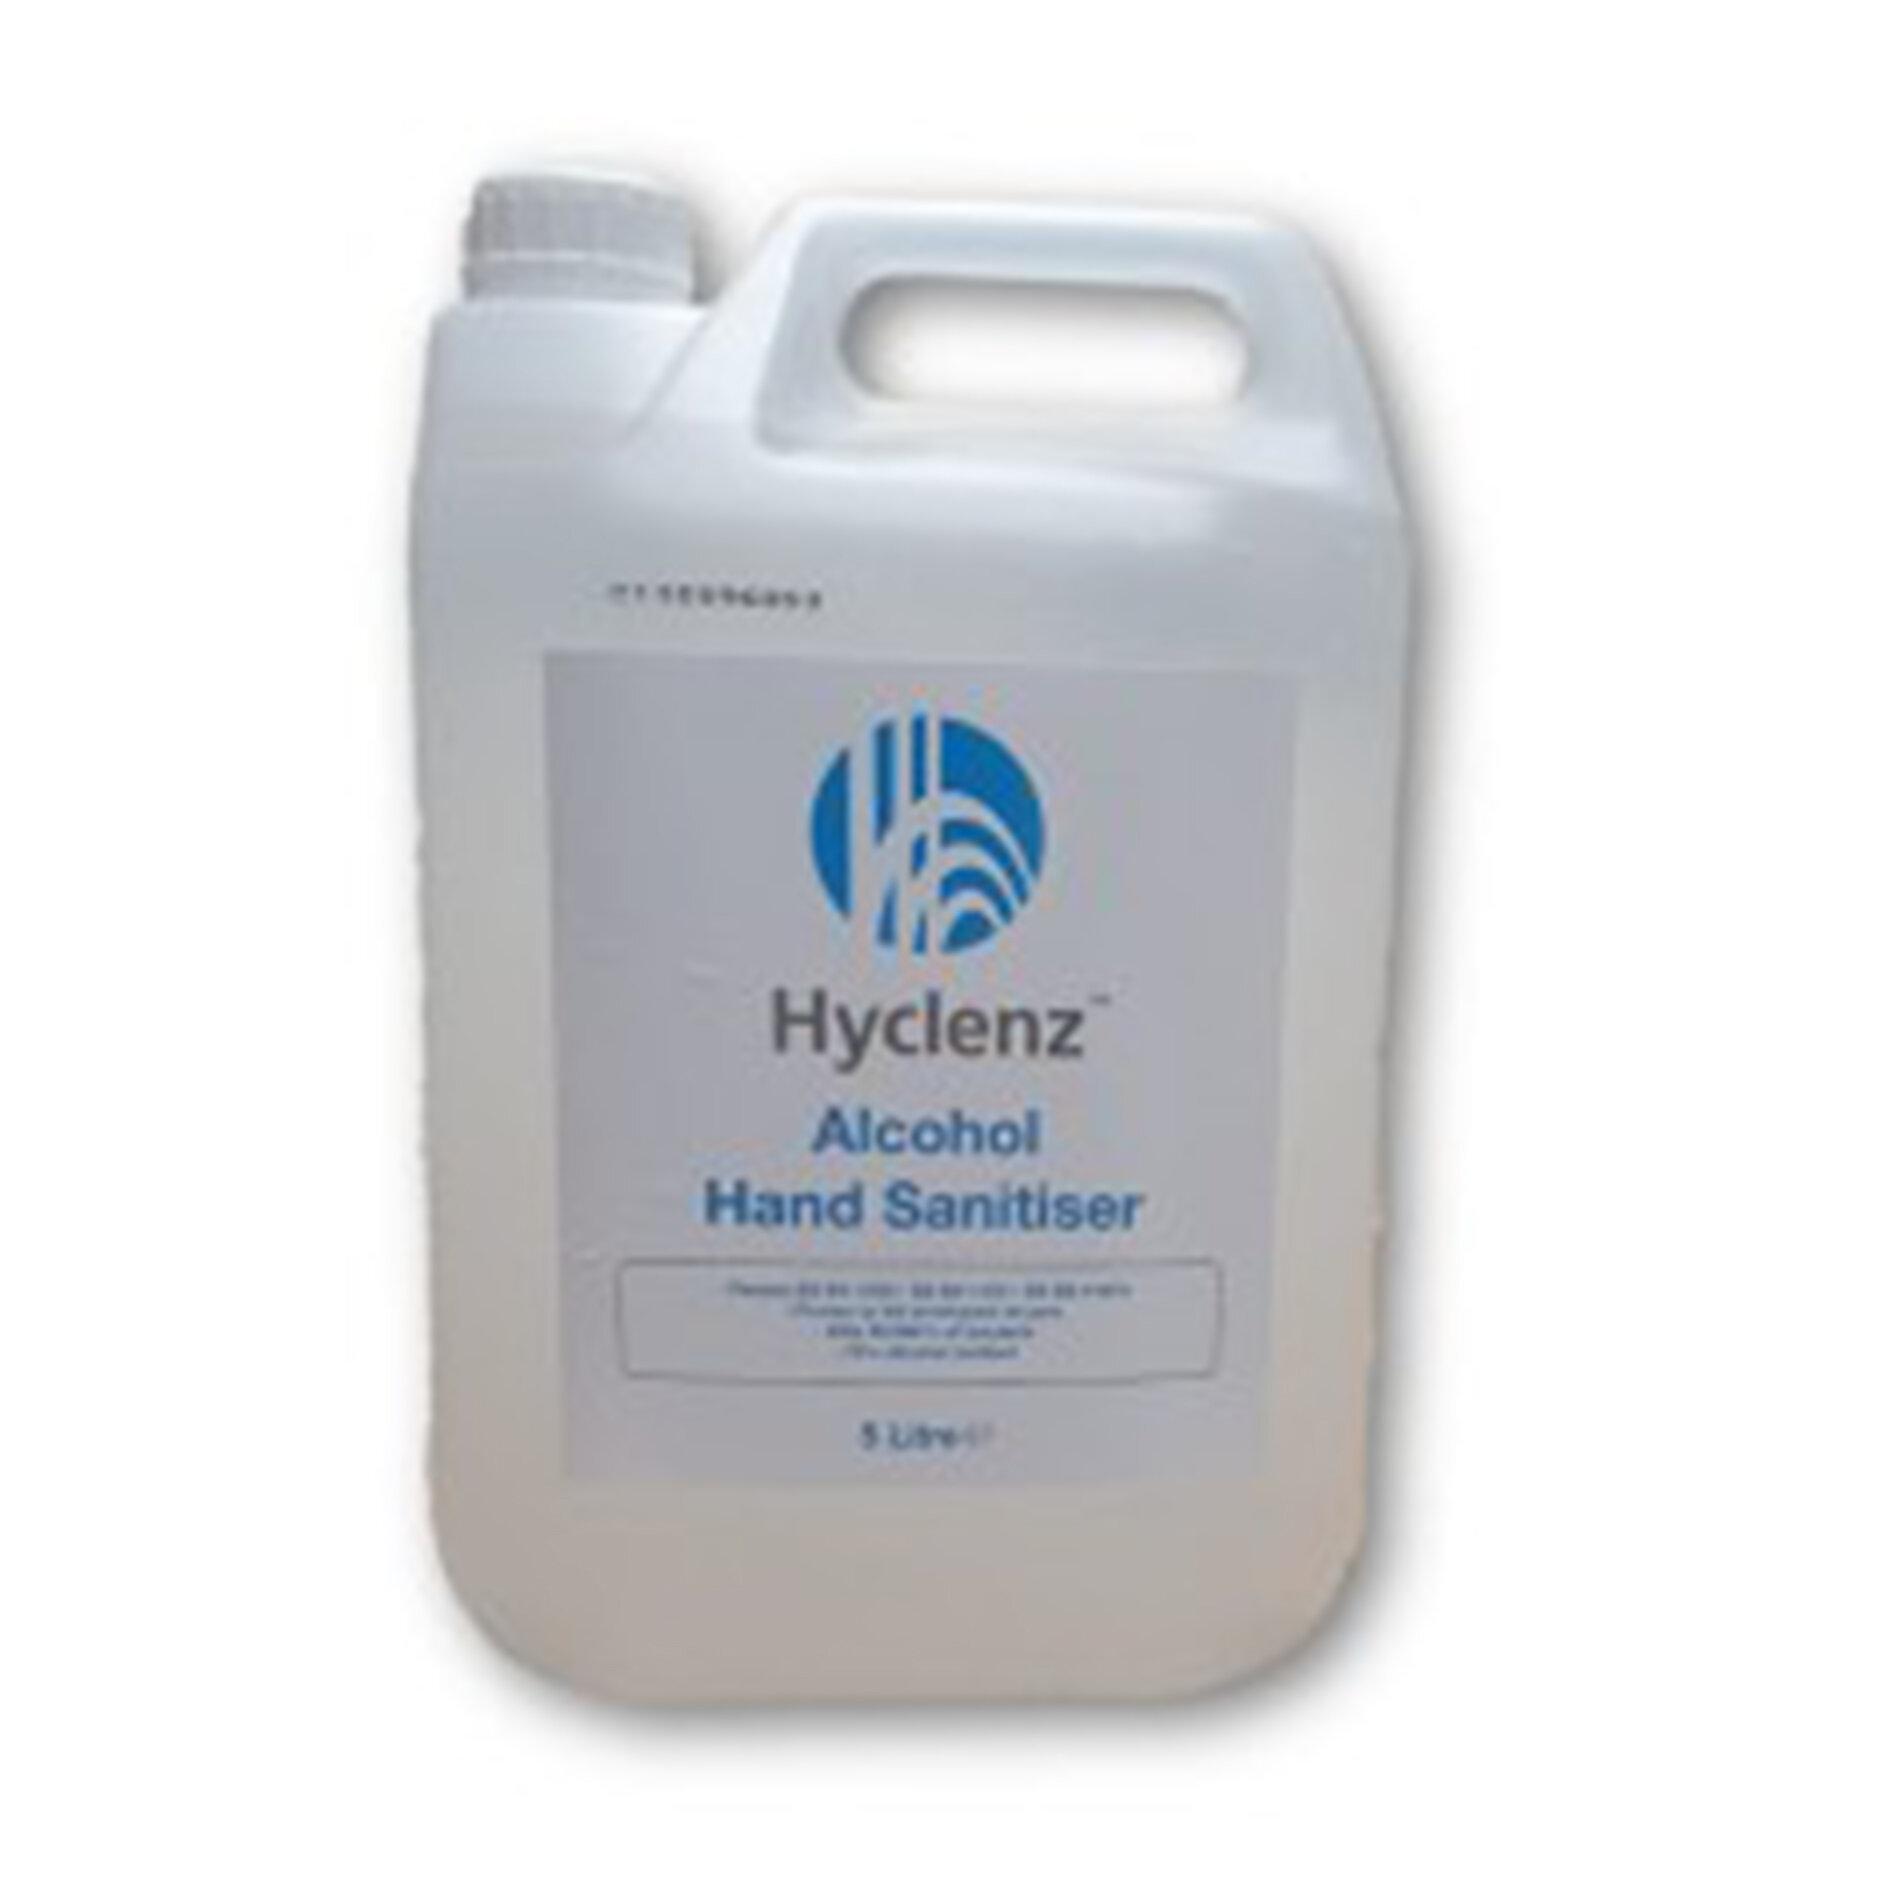 5ltr Hyclenz Alcohol Hand Sanitiser